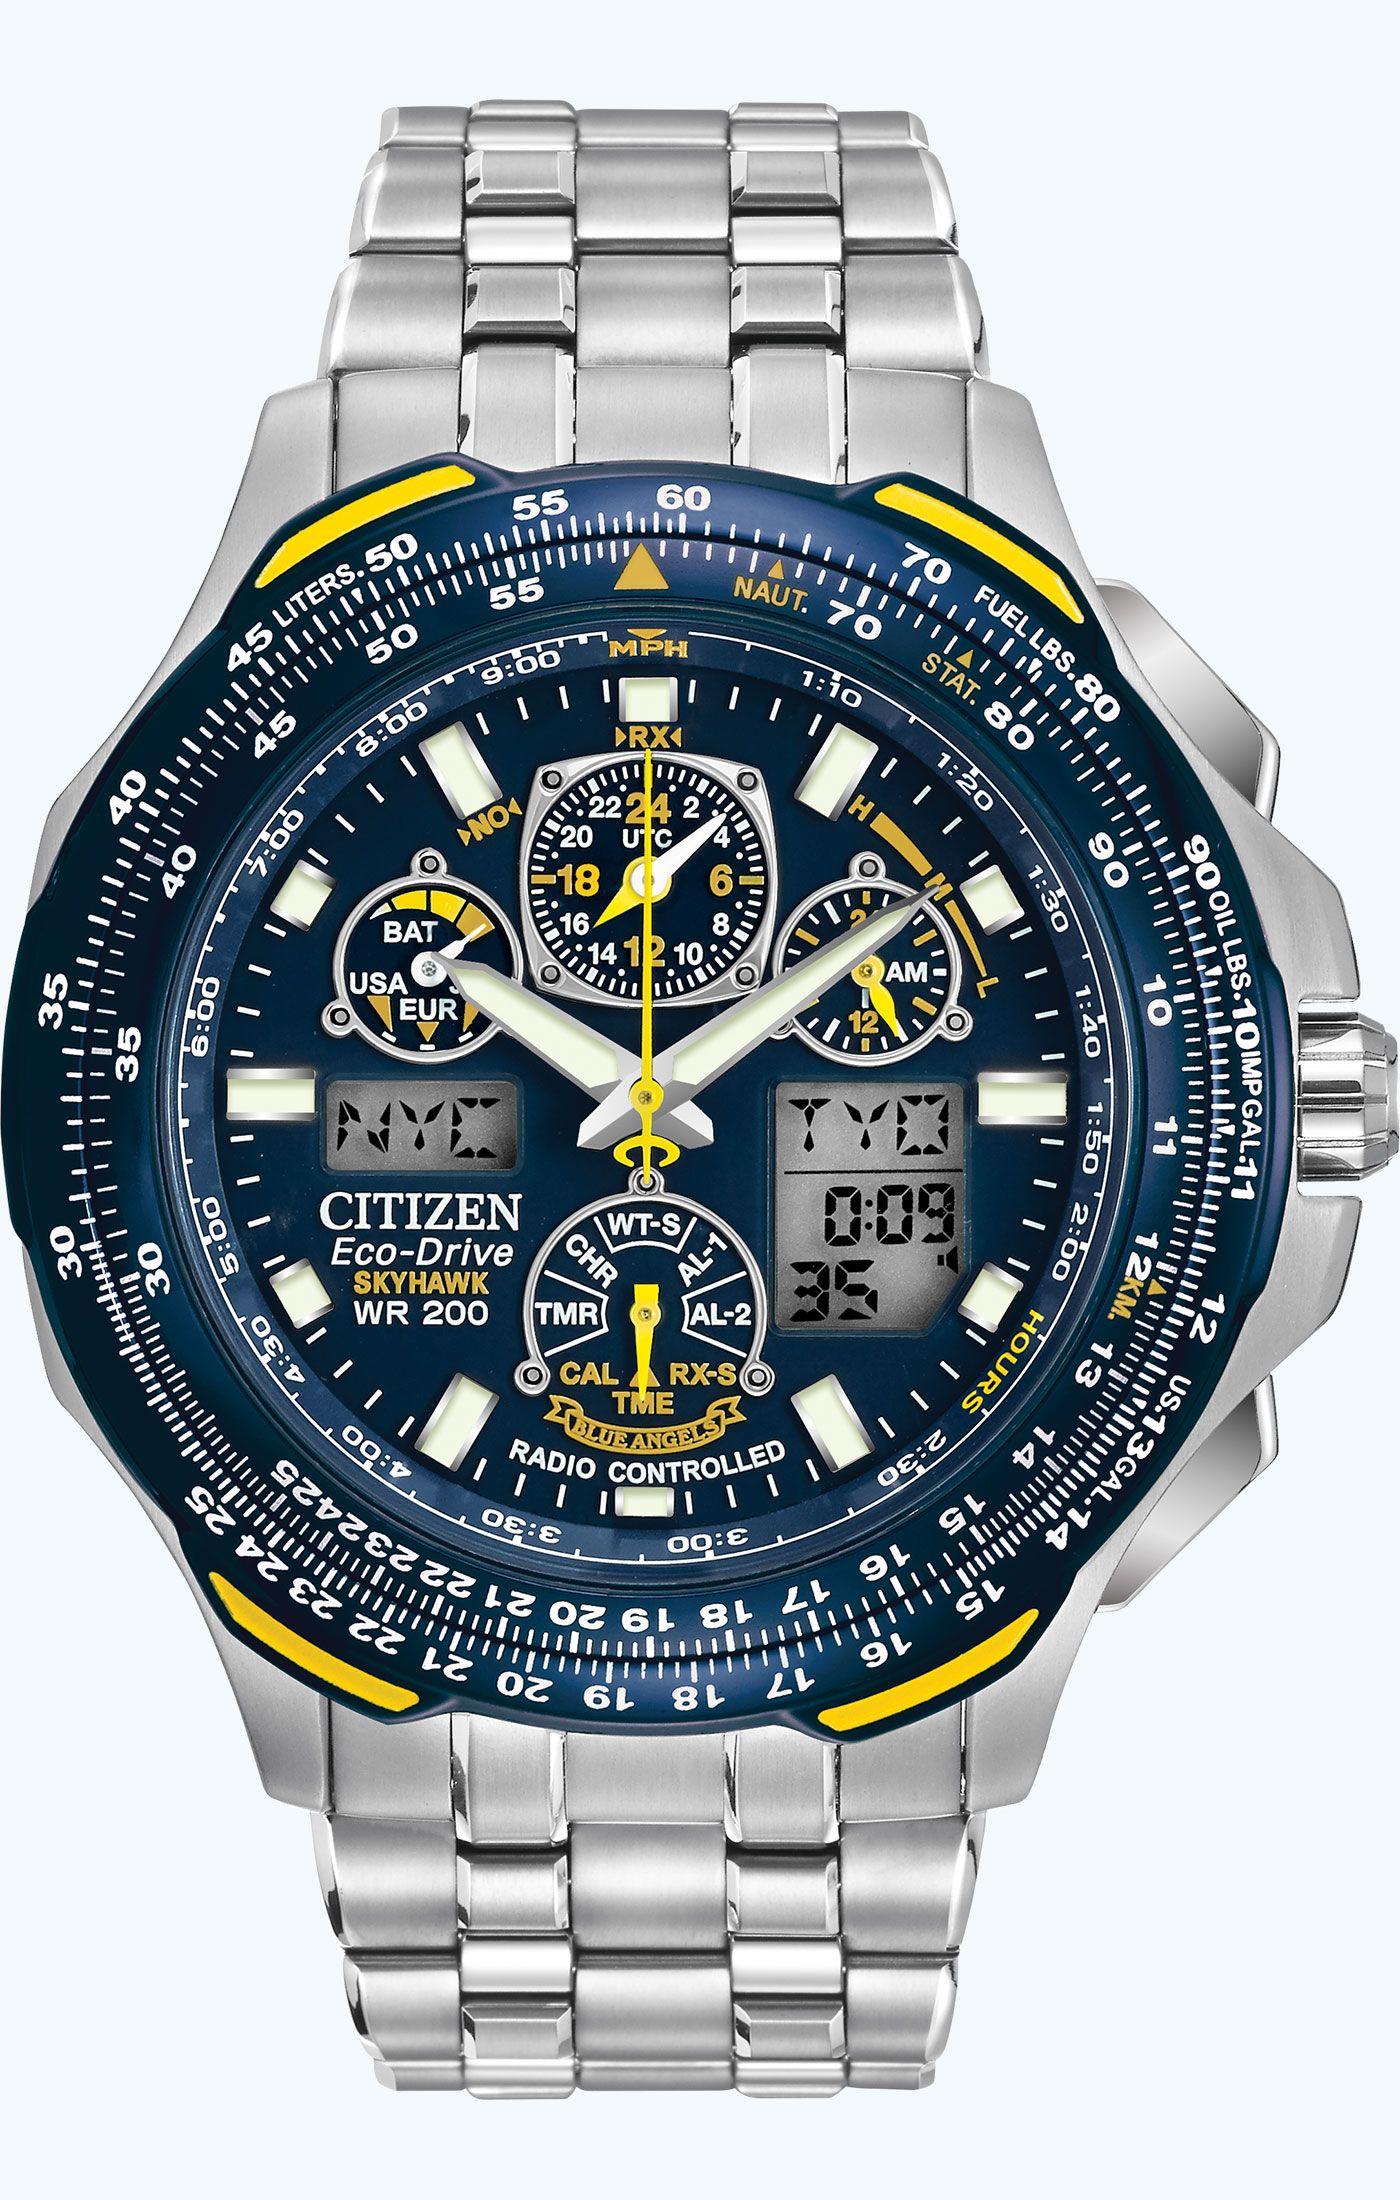 2d10b19825c Citizen Citizen Eco-Drive Blue Angels Skyhawk A-T JY0040-59L Atomic  Timekeeping